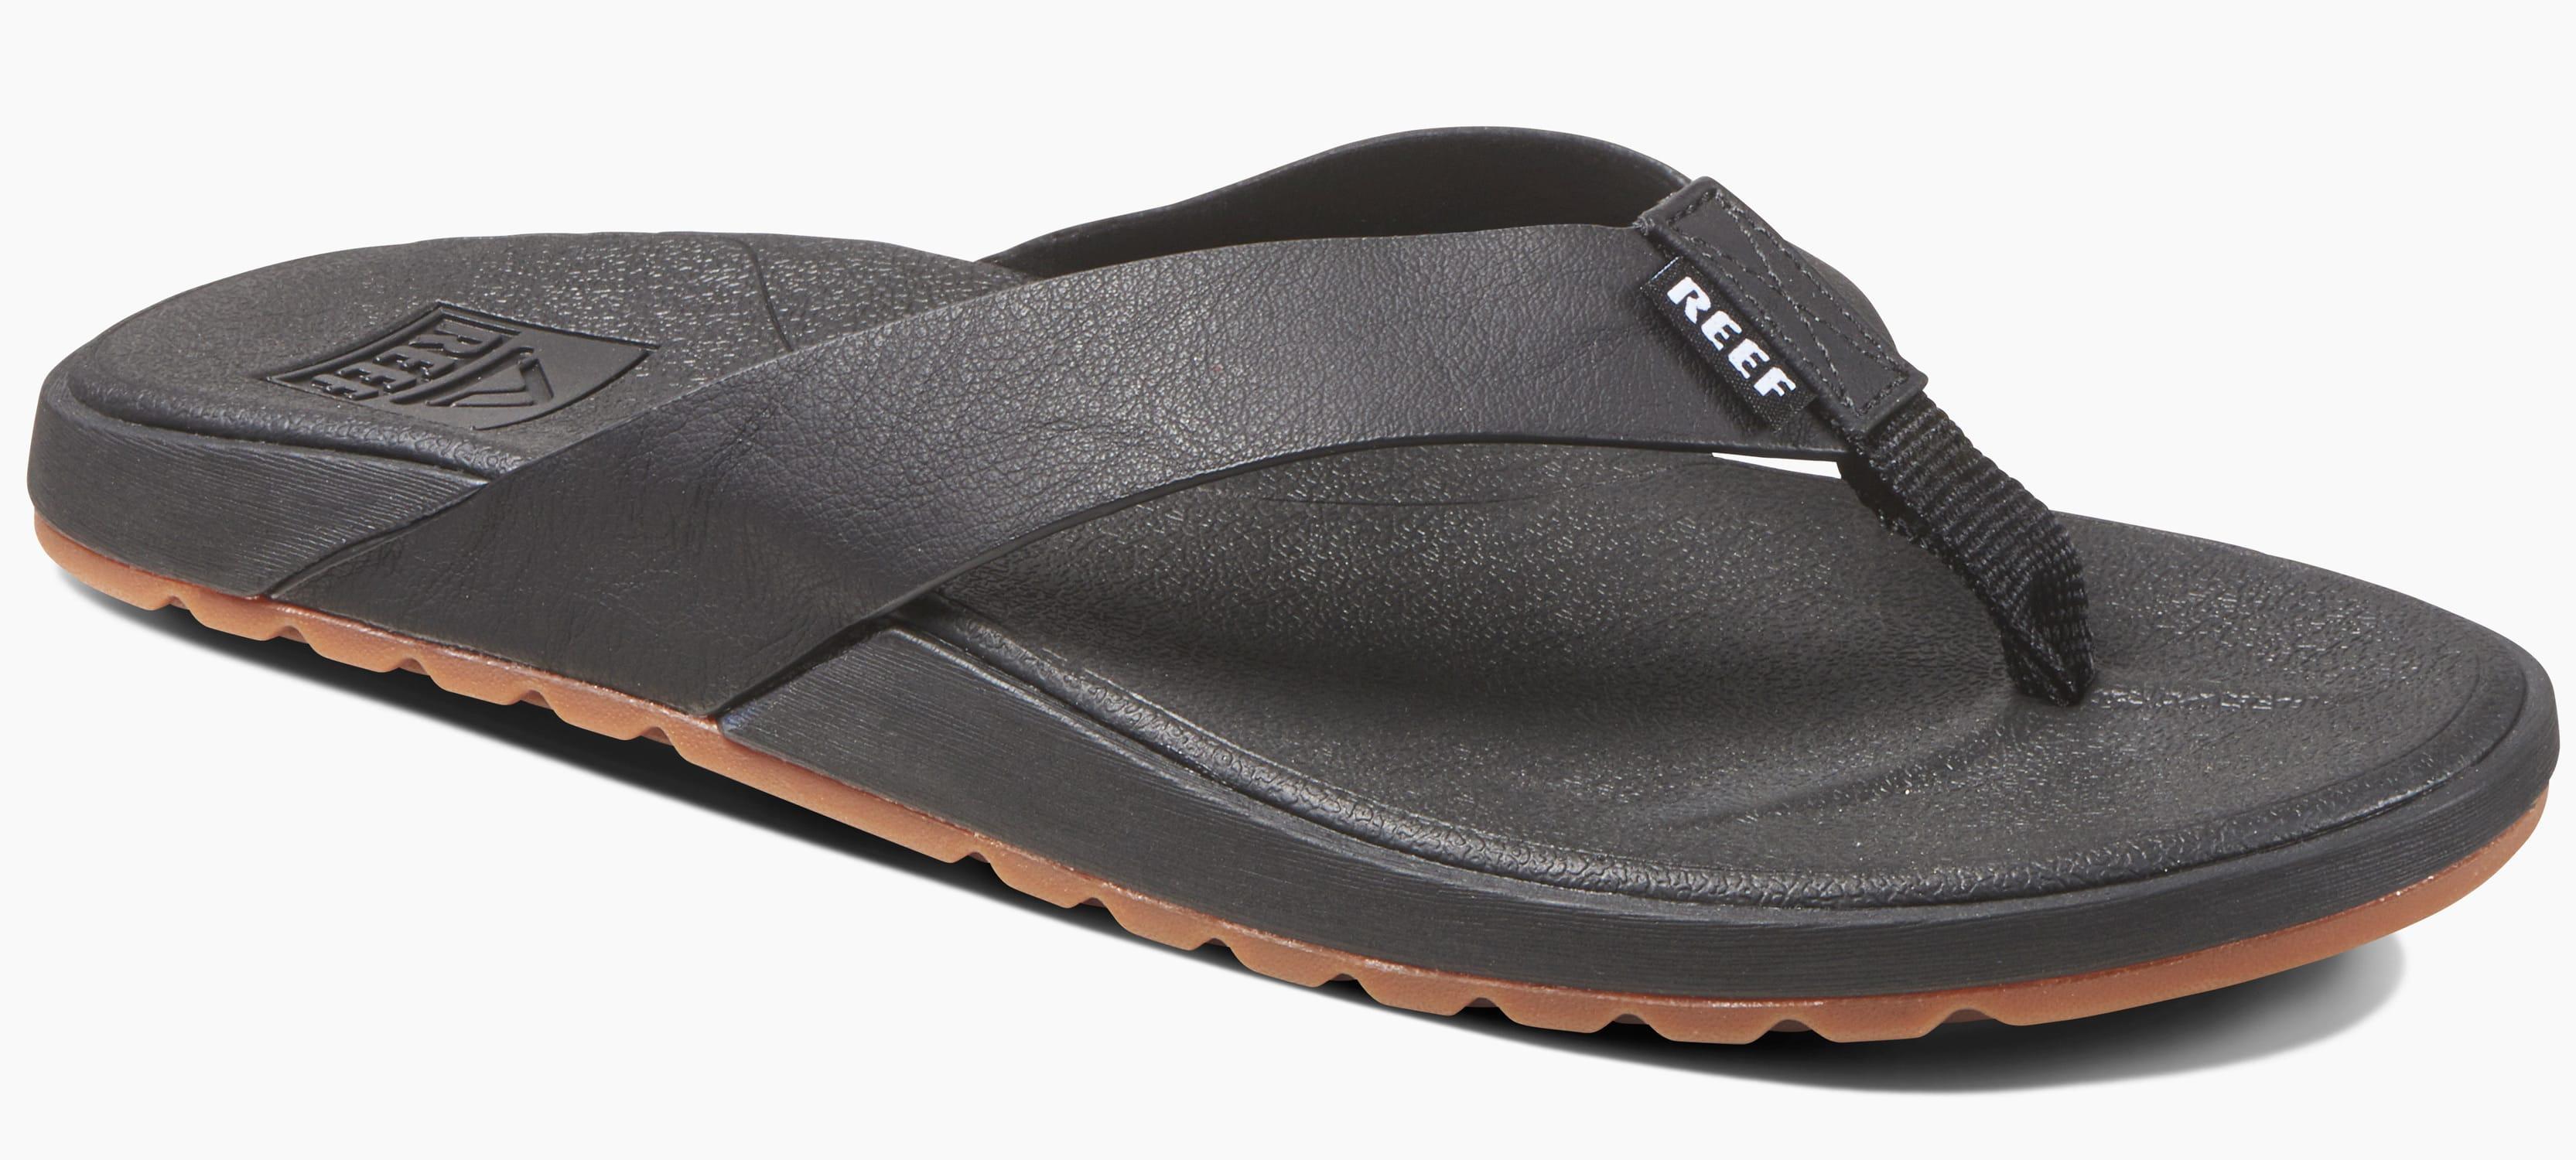 96752a0b4613 Reef contoured voyage sandals thumbnail jpg 3330x1500 Reef sandaks